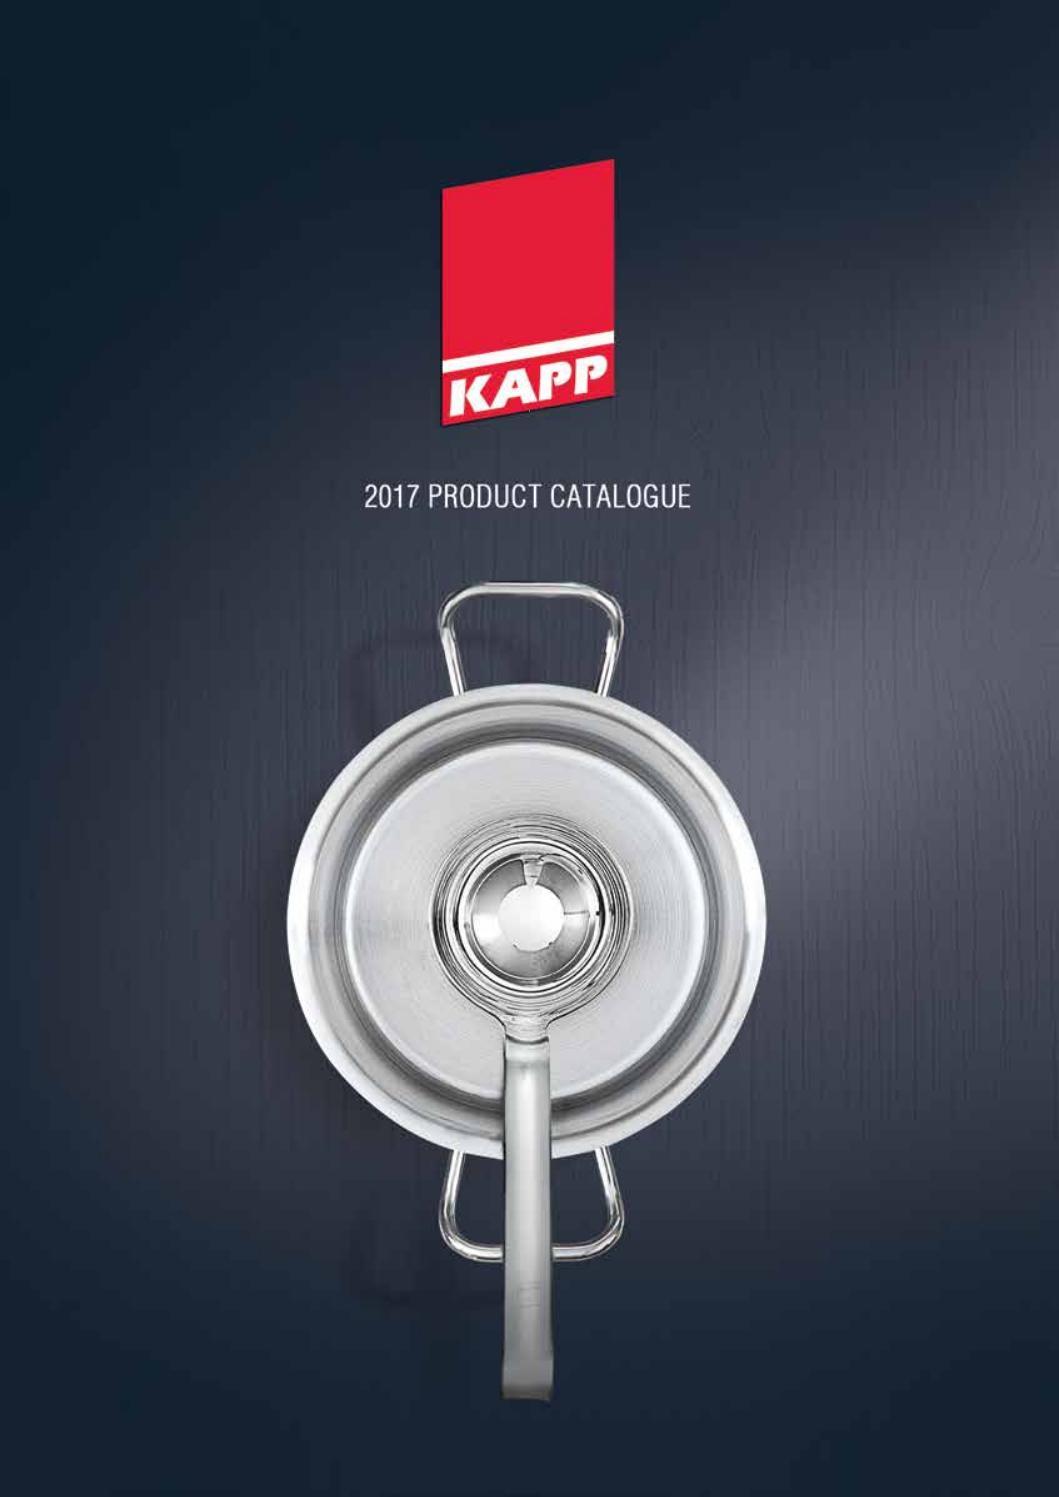 Casserole Induction Compatible Vitroceramique kapp katalogs 2017gagaagga - issuu